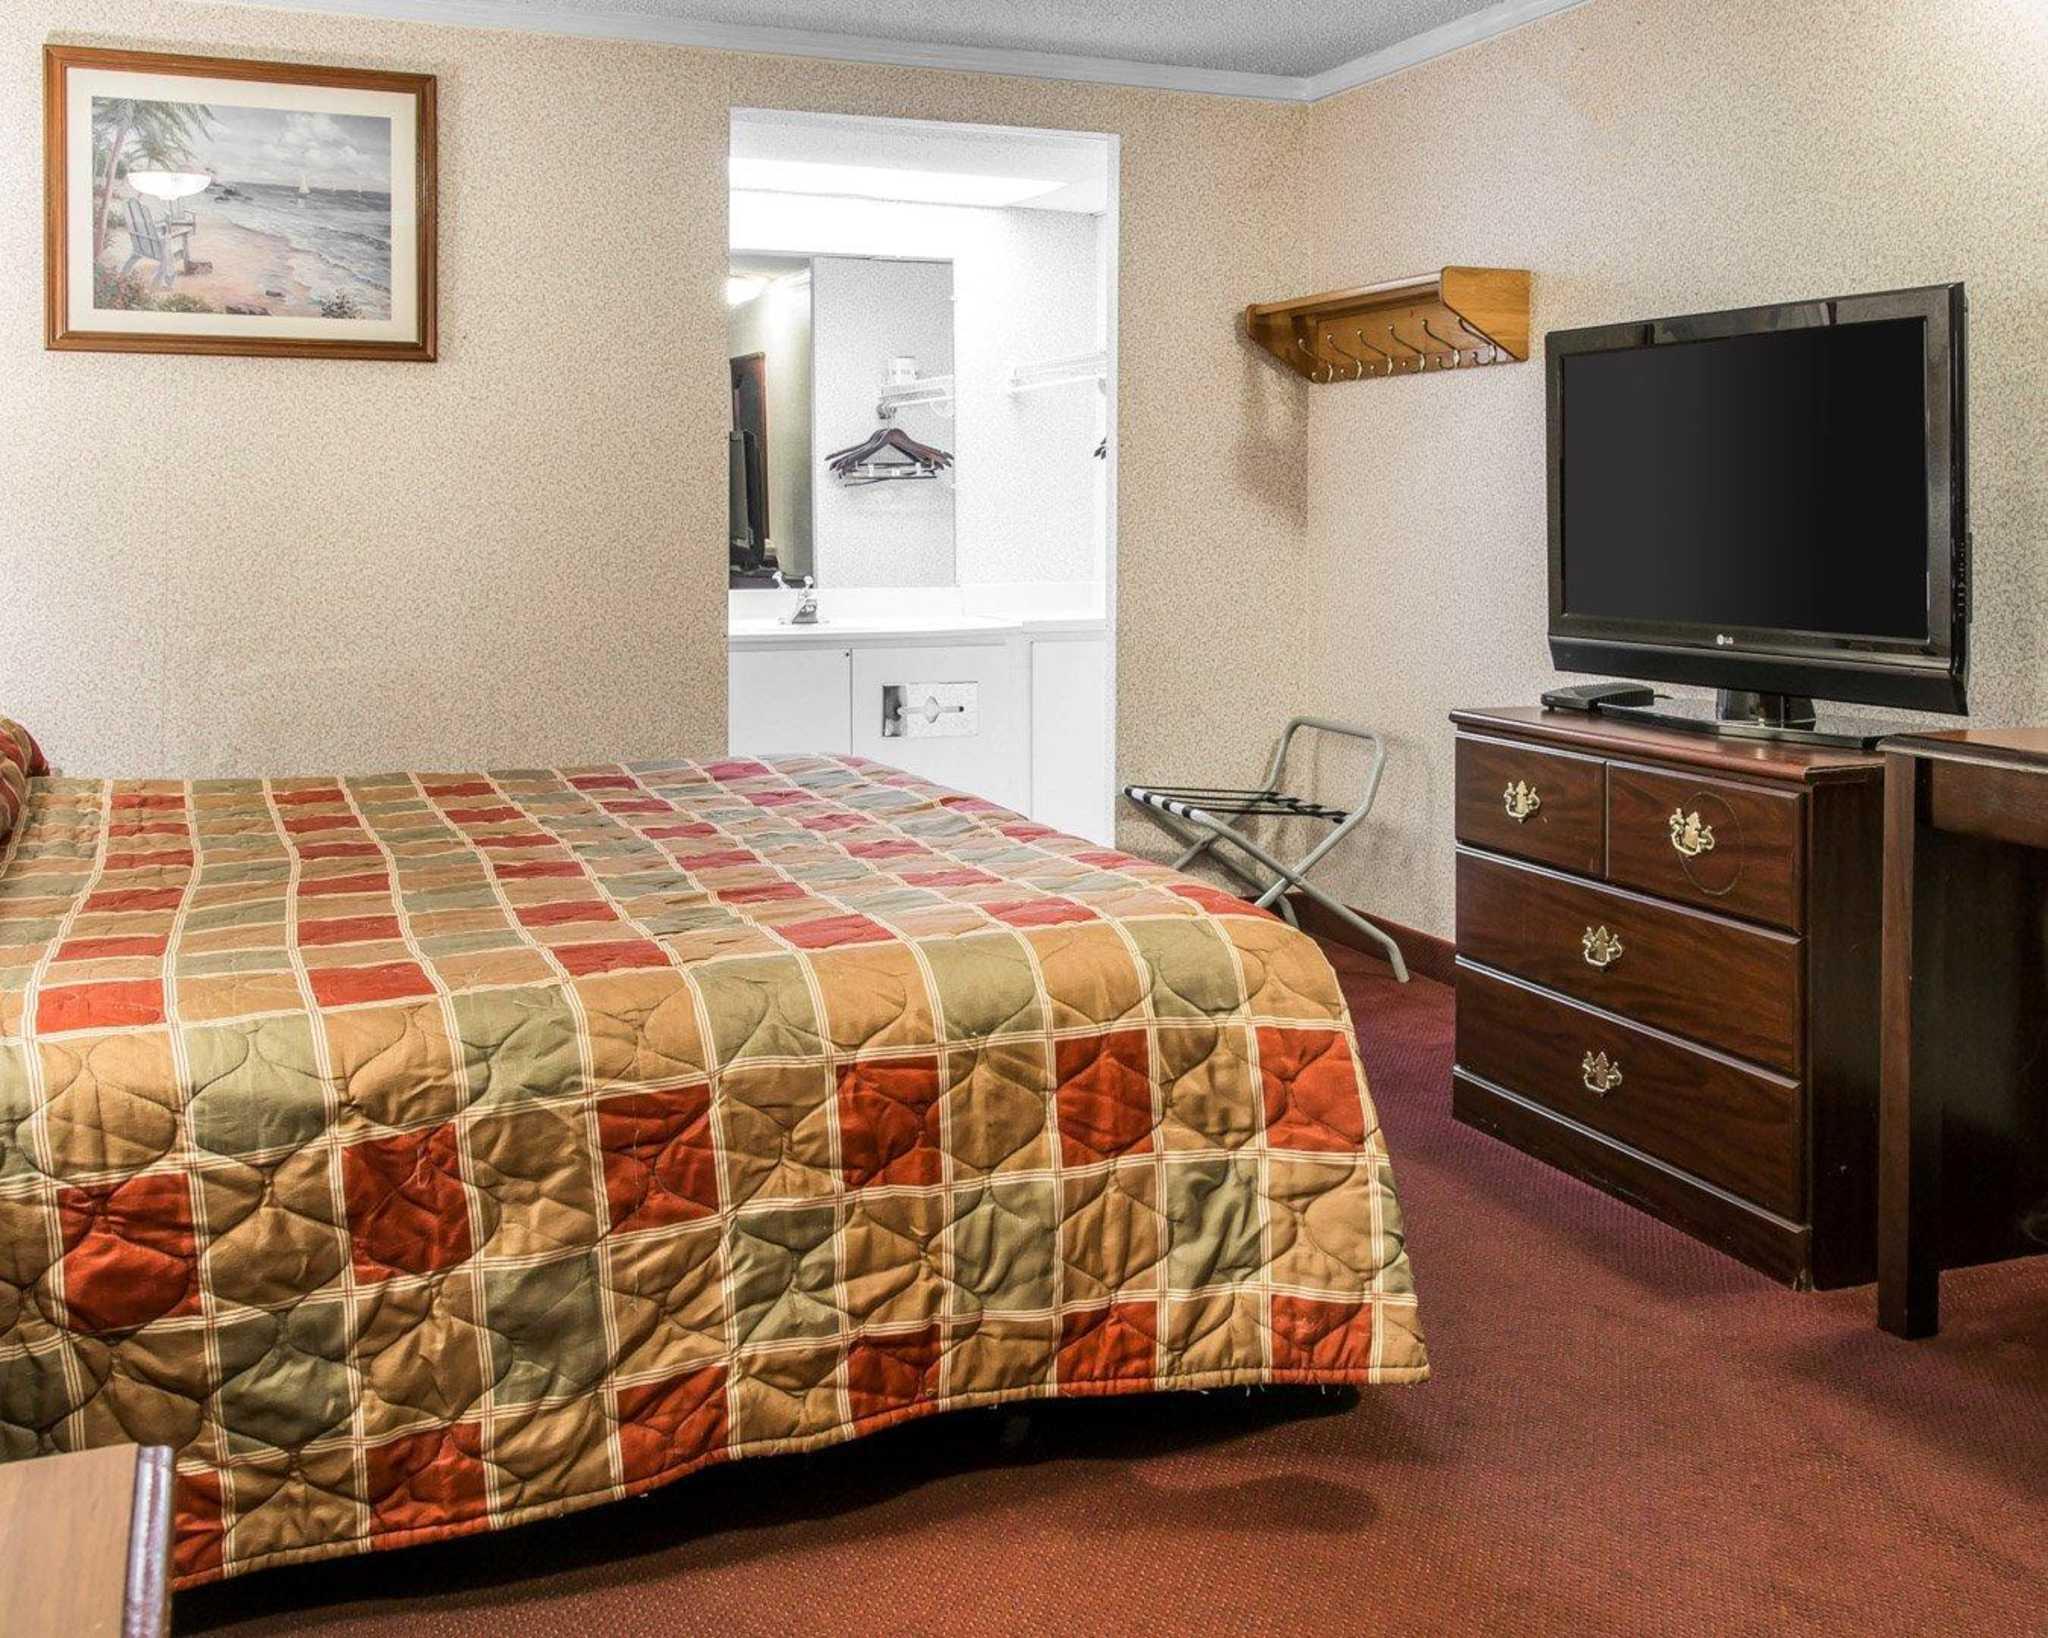 Rodeway Inn image 9